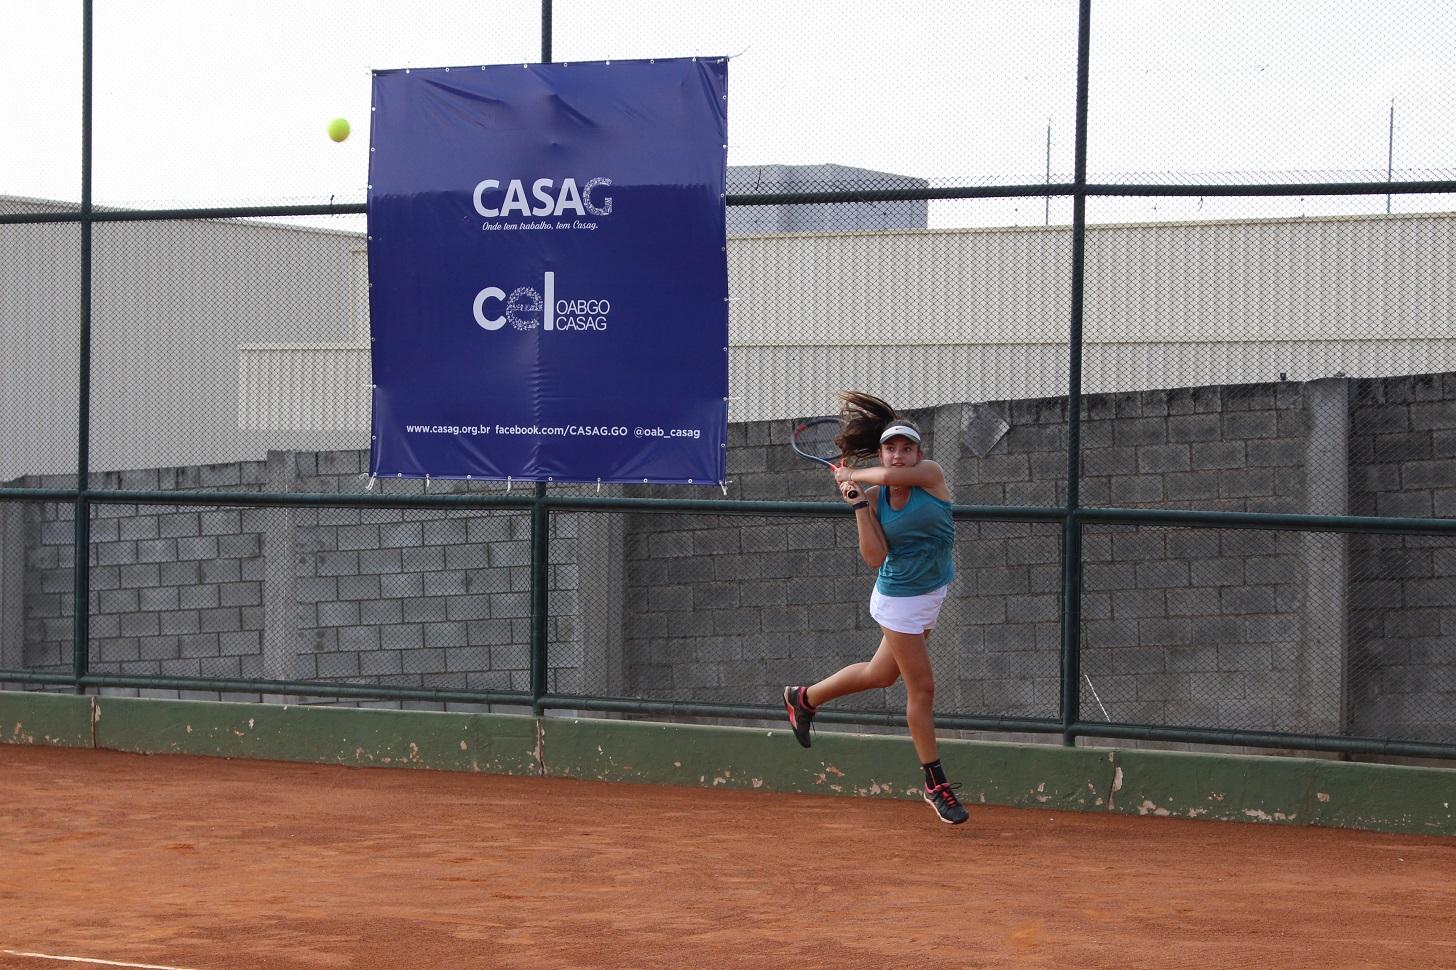 Adolescente de 14 anos é destaque no Aberto de Tênis da CASAG